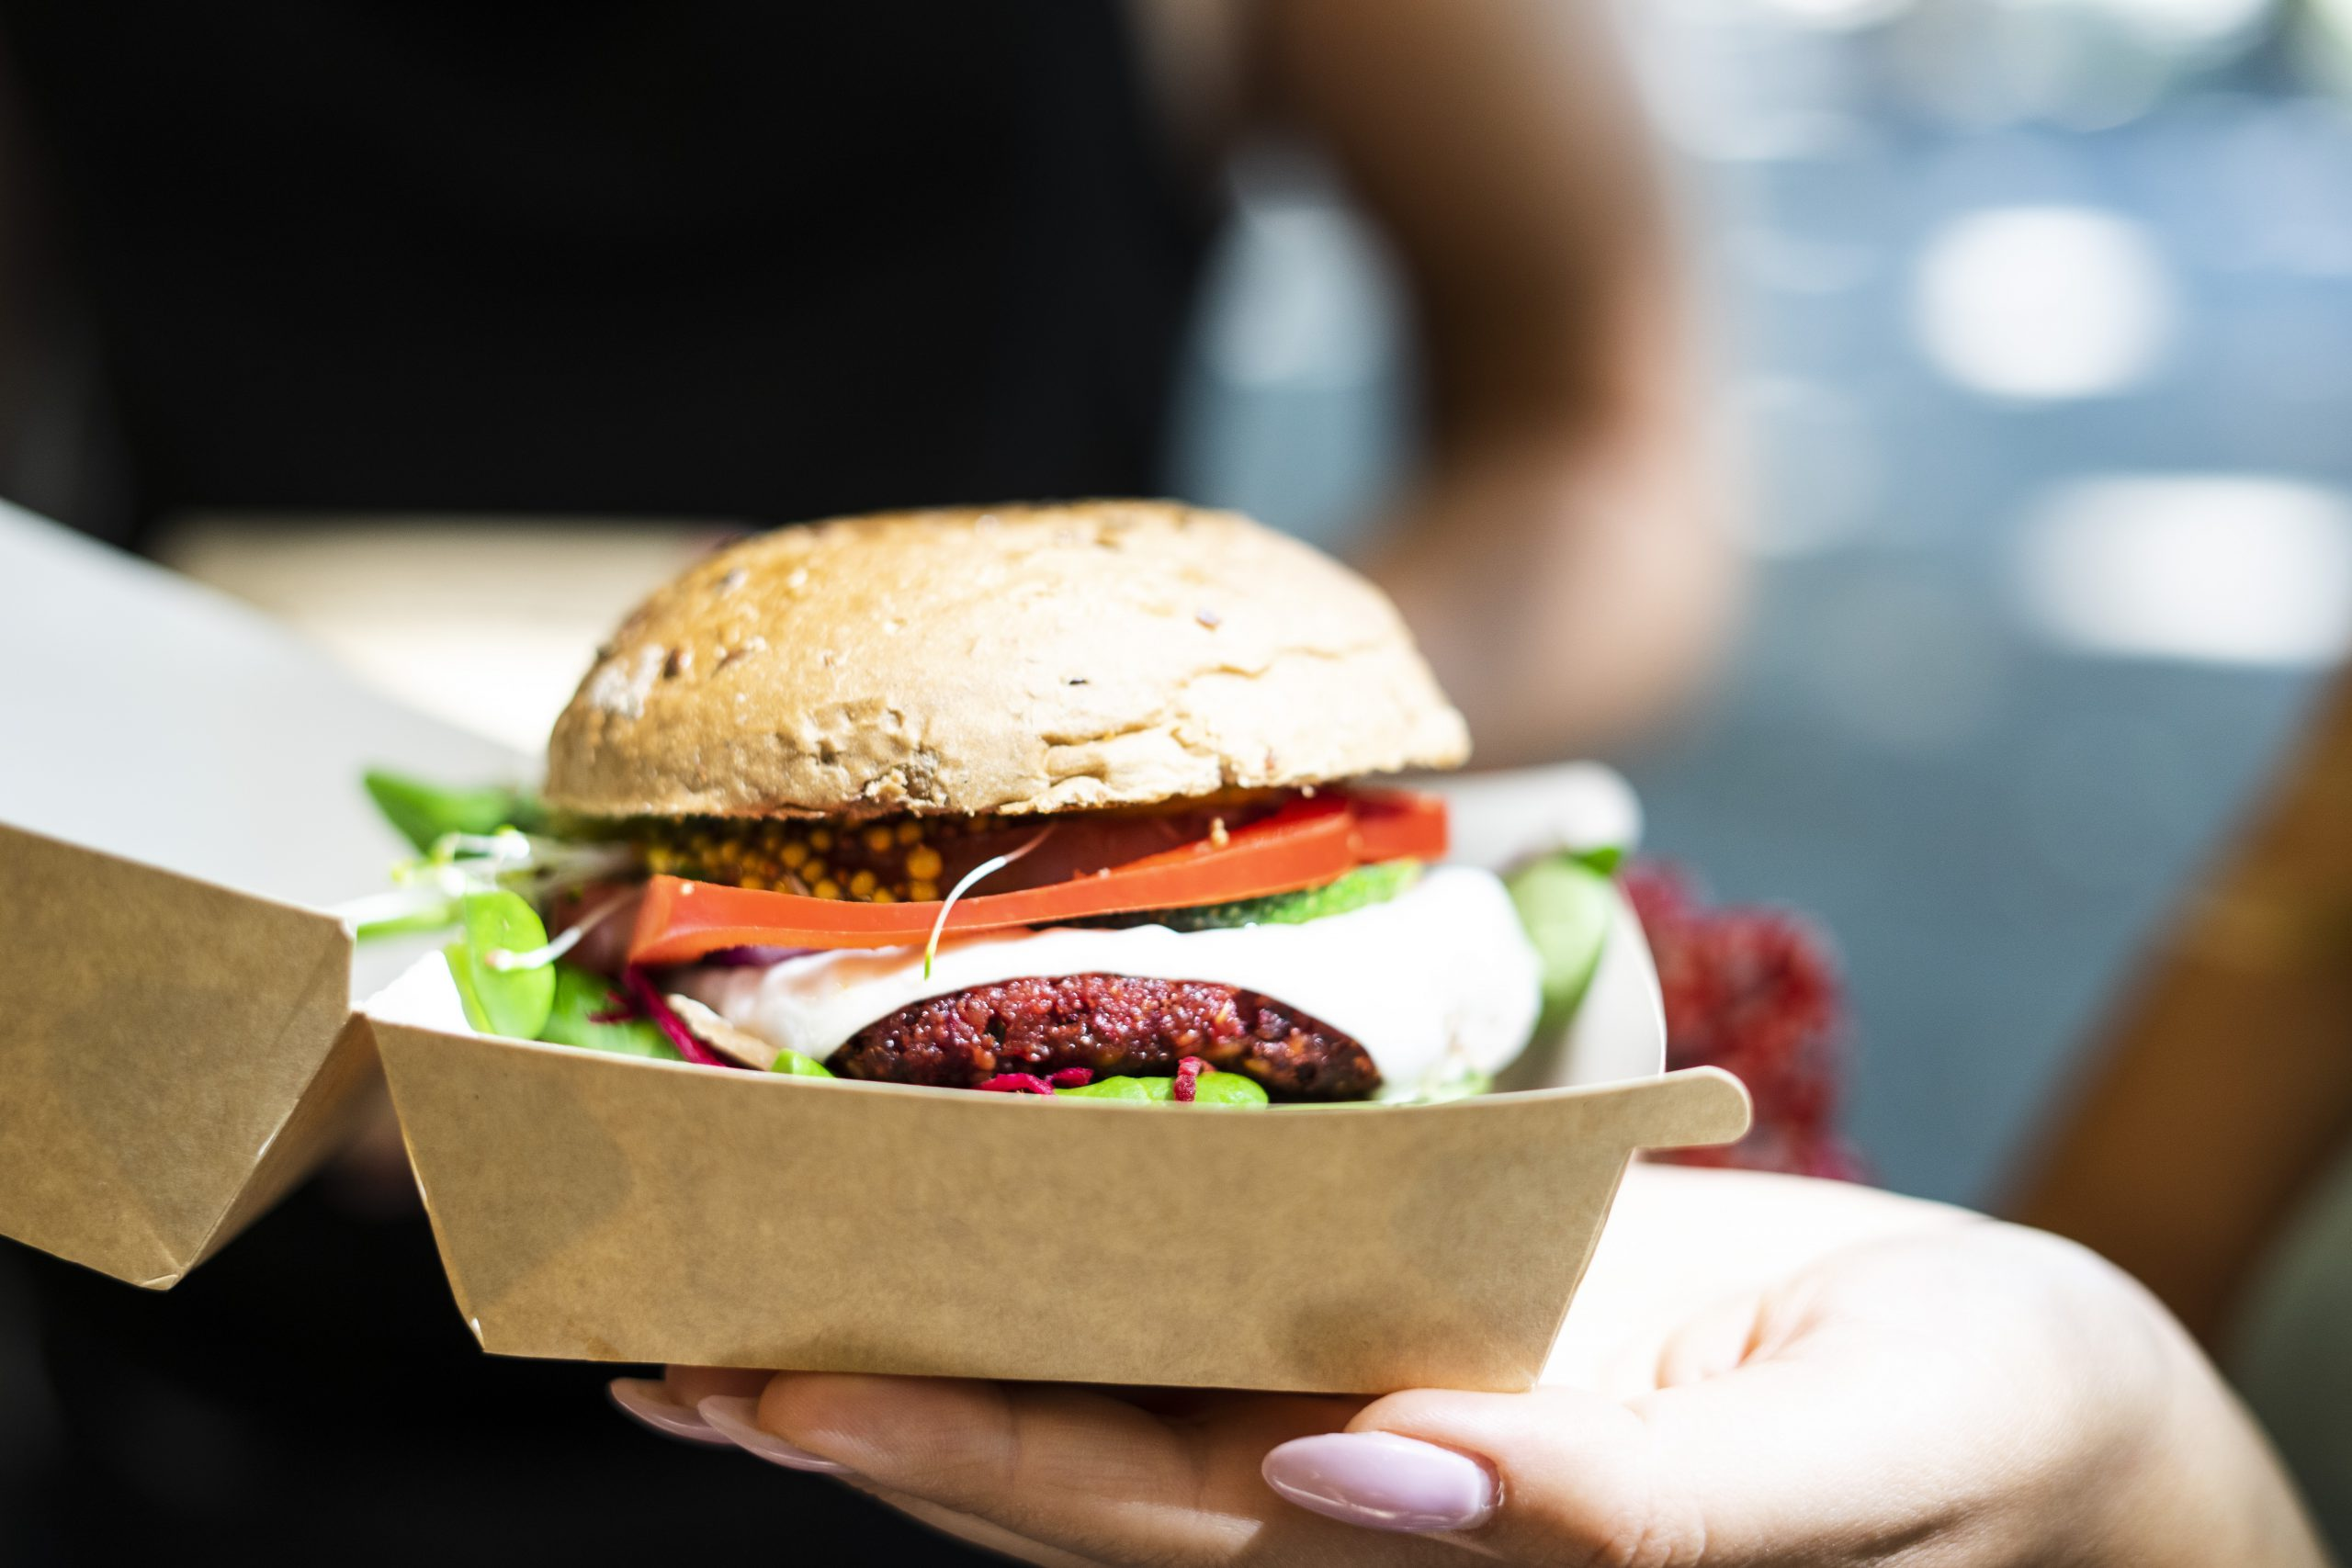 Vege/vegan burger - burak, marchew, bób